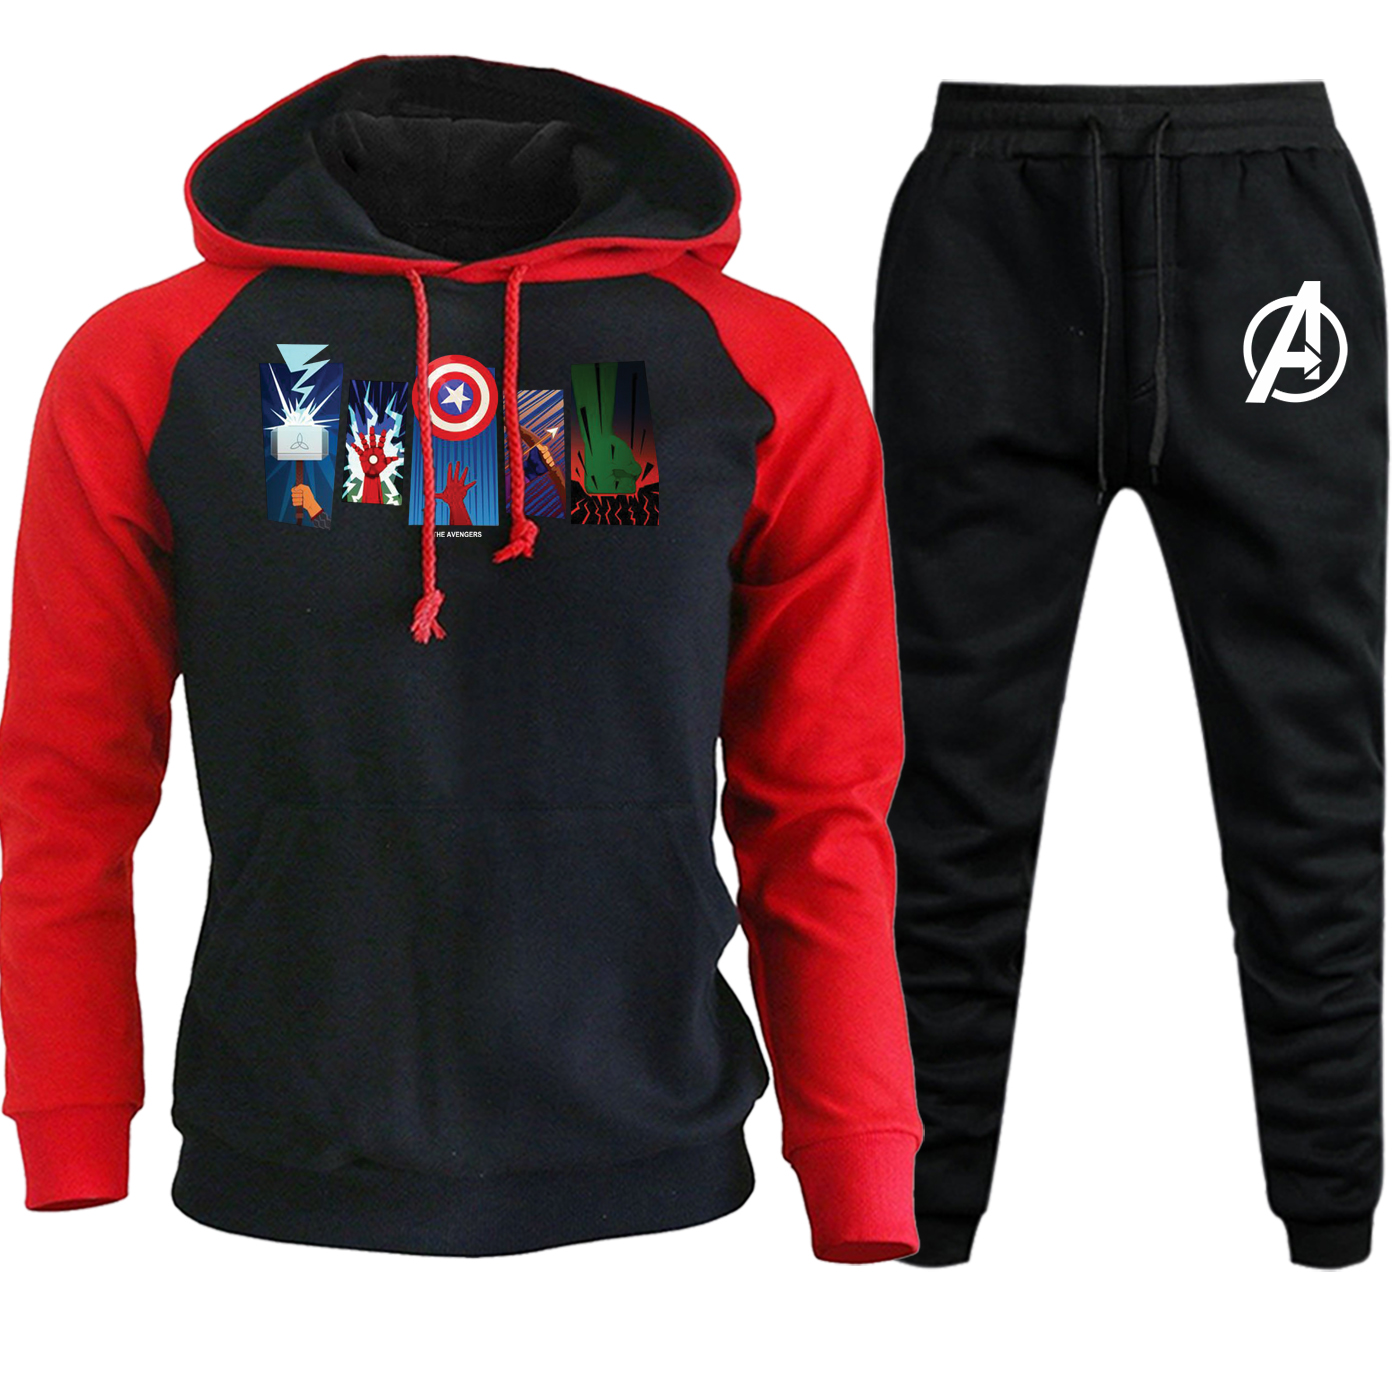 Autumn Winter 2019 The Avengers Hero Arms Hooded Mens Raglan Streetwear Suit Casual Pullover Fleece Hoodies+Pants 2 Piece Set